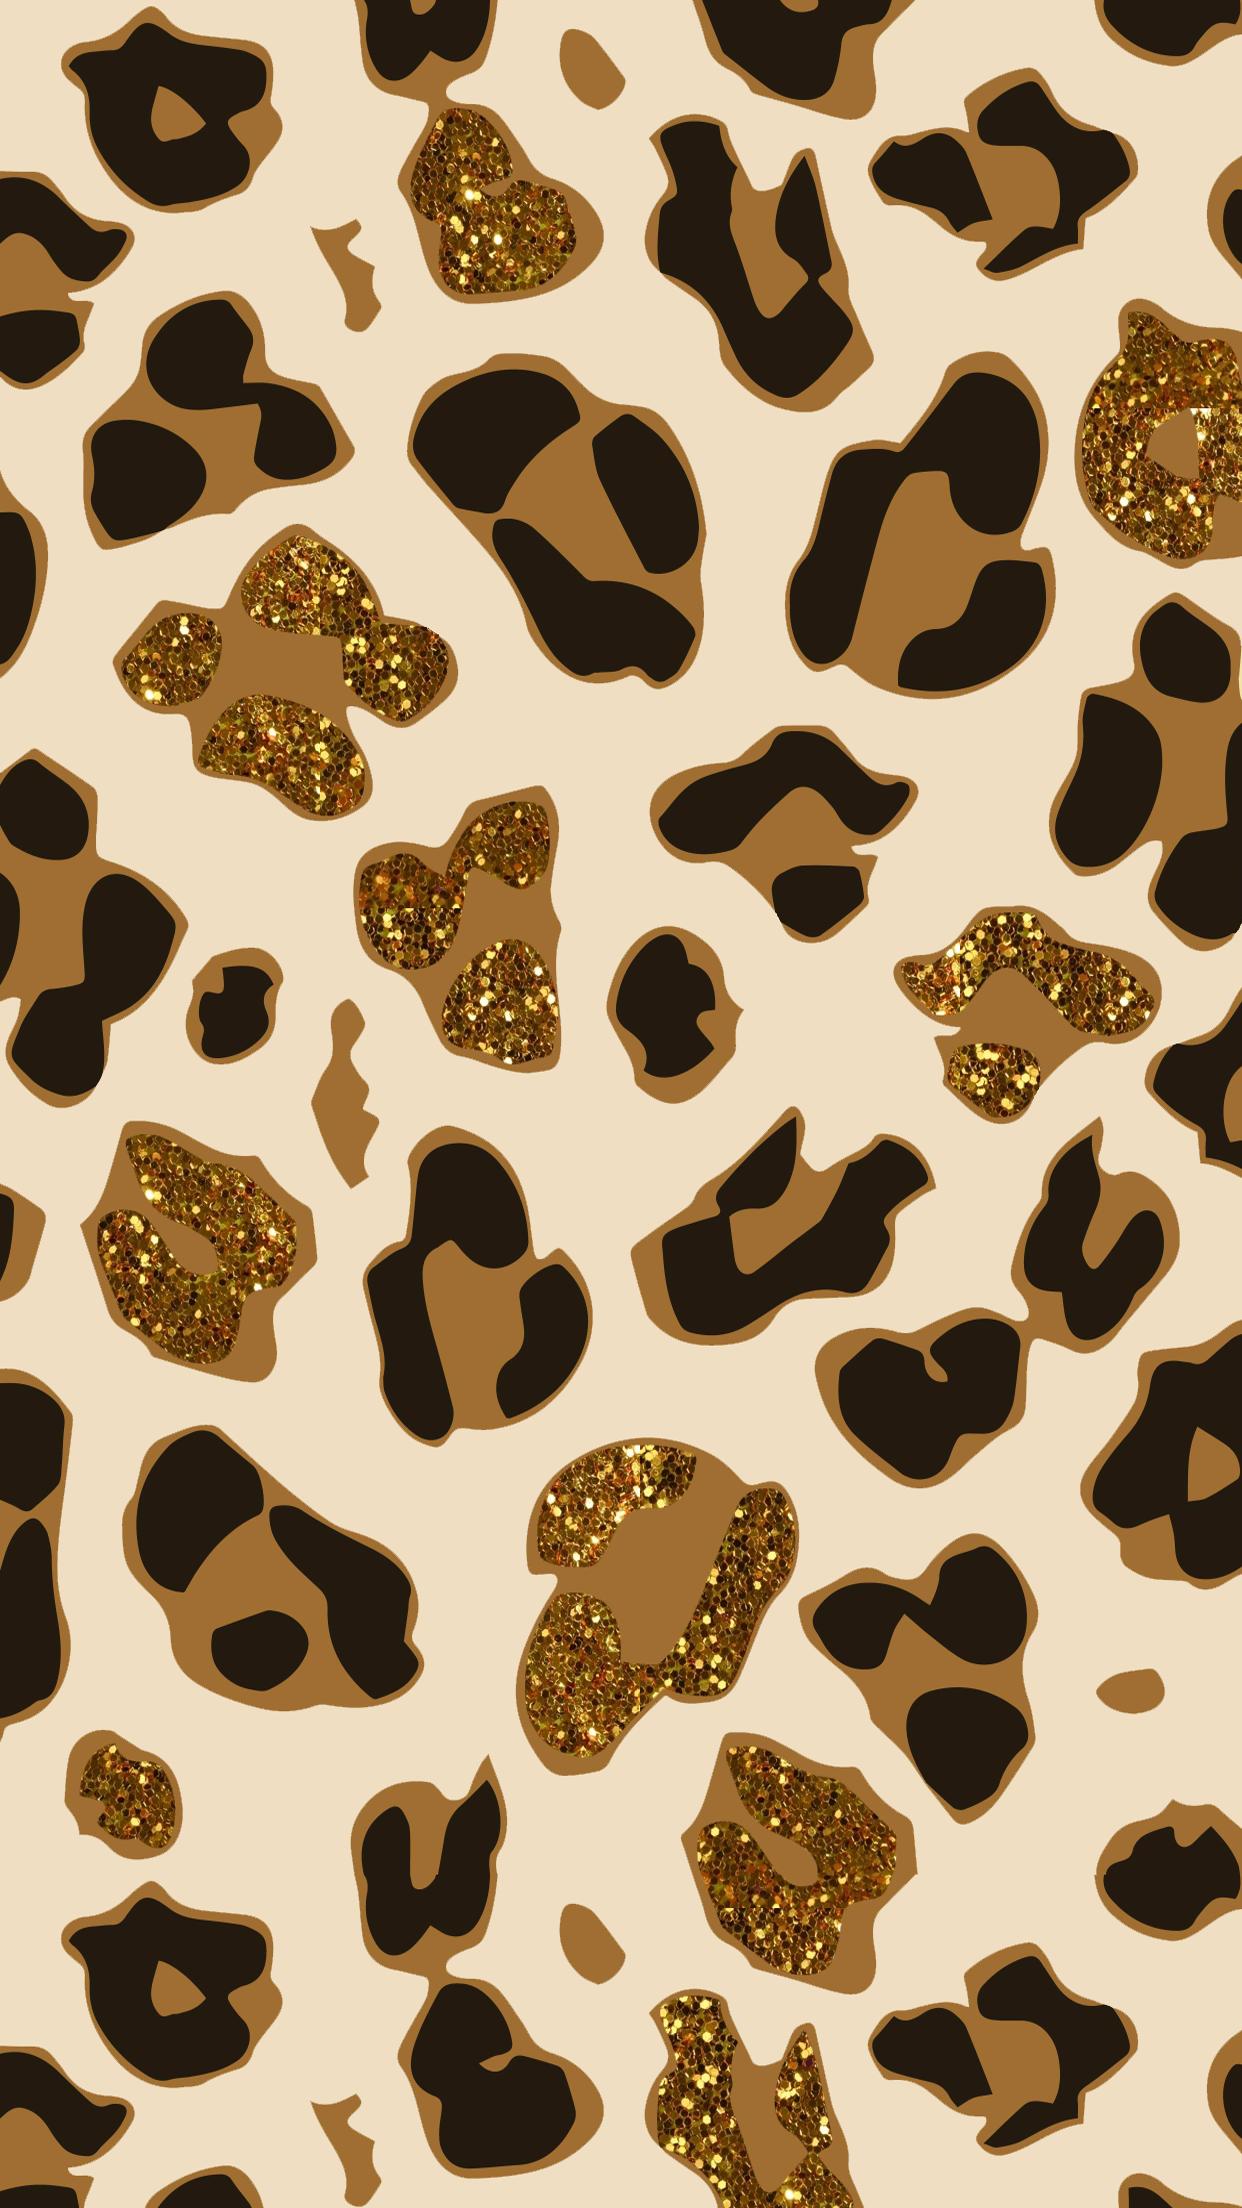 Dogsandcats Jungleanimals Leopard Print Wallpaper Animal Print Wallpaper Cheetah Print Wallpaper